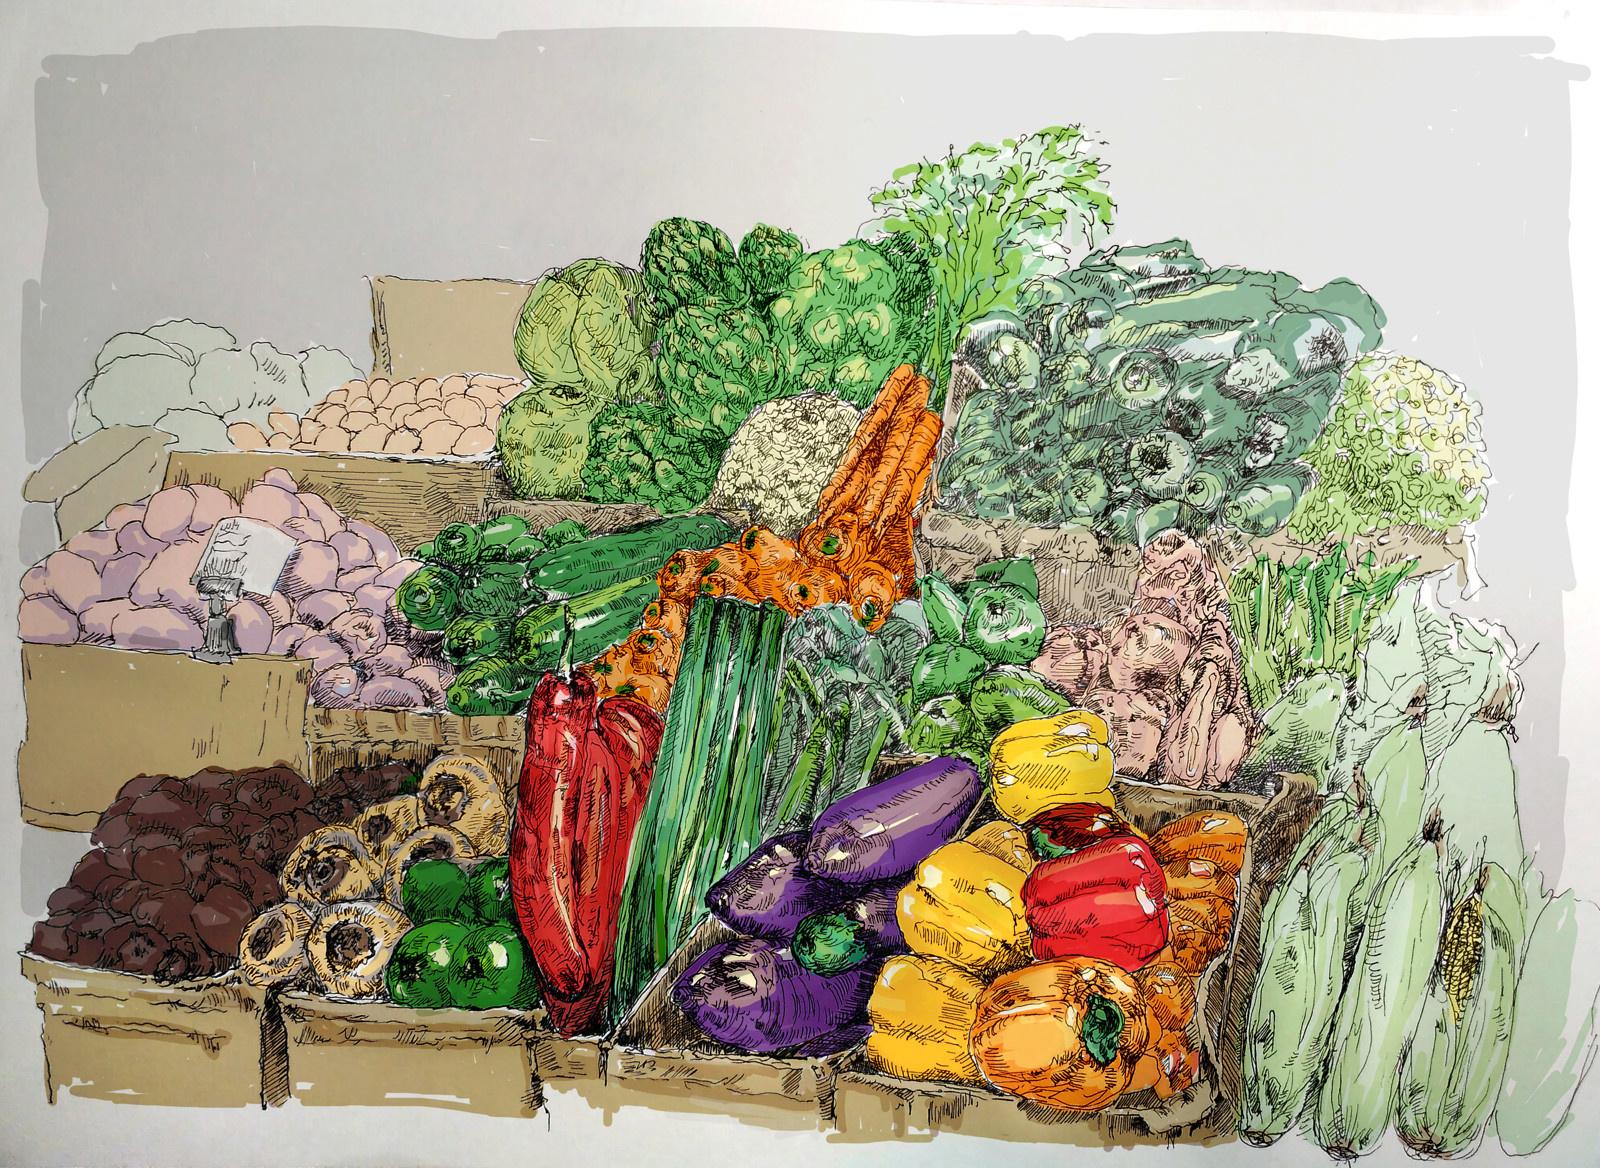 Barevna Zelenina Pc Kresba Zbozi Prodejce Lucstokl Fler Cz